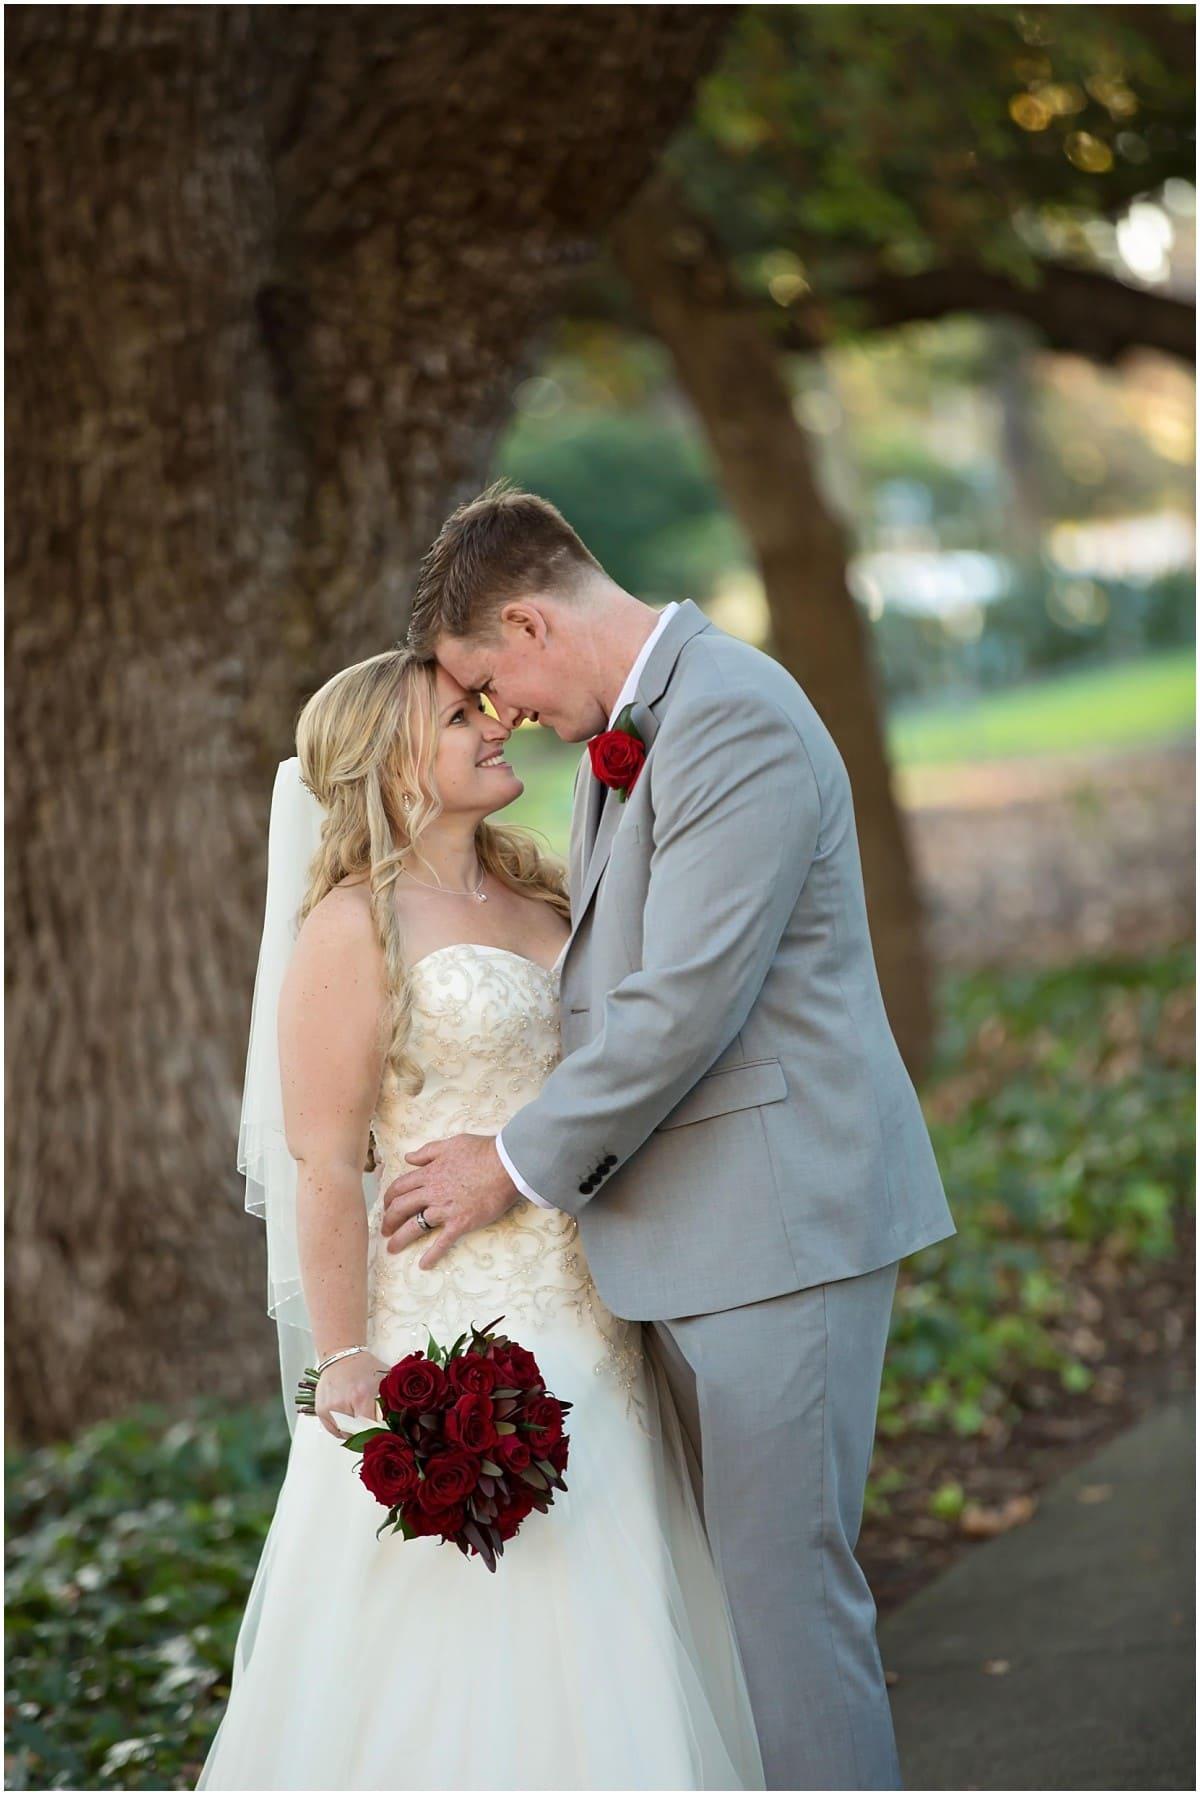 pagoda queens gardens wedding, Pagoda Resort & Spa | Queens Gardens Wedding for Katie & Jon